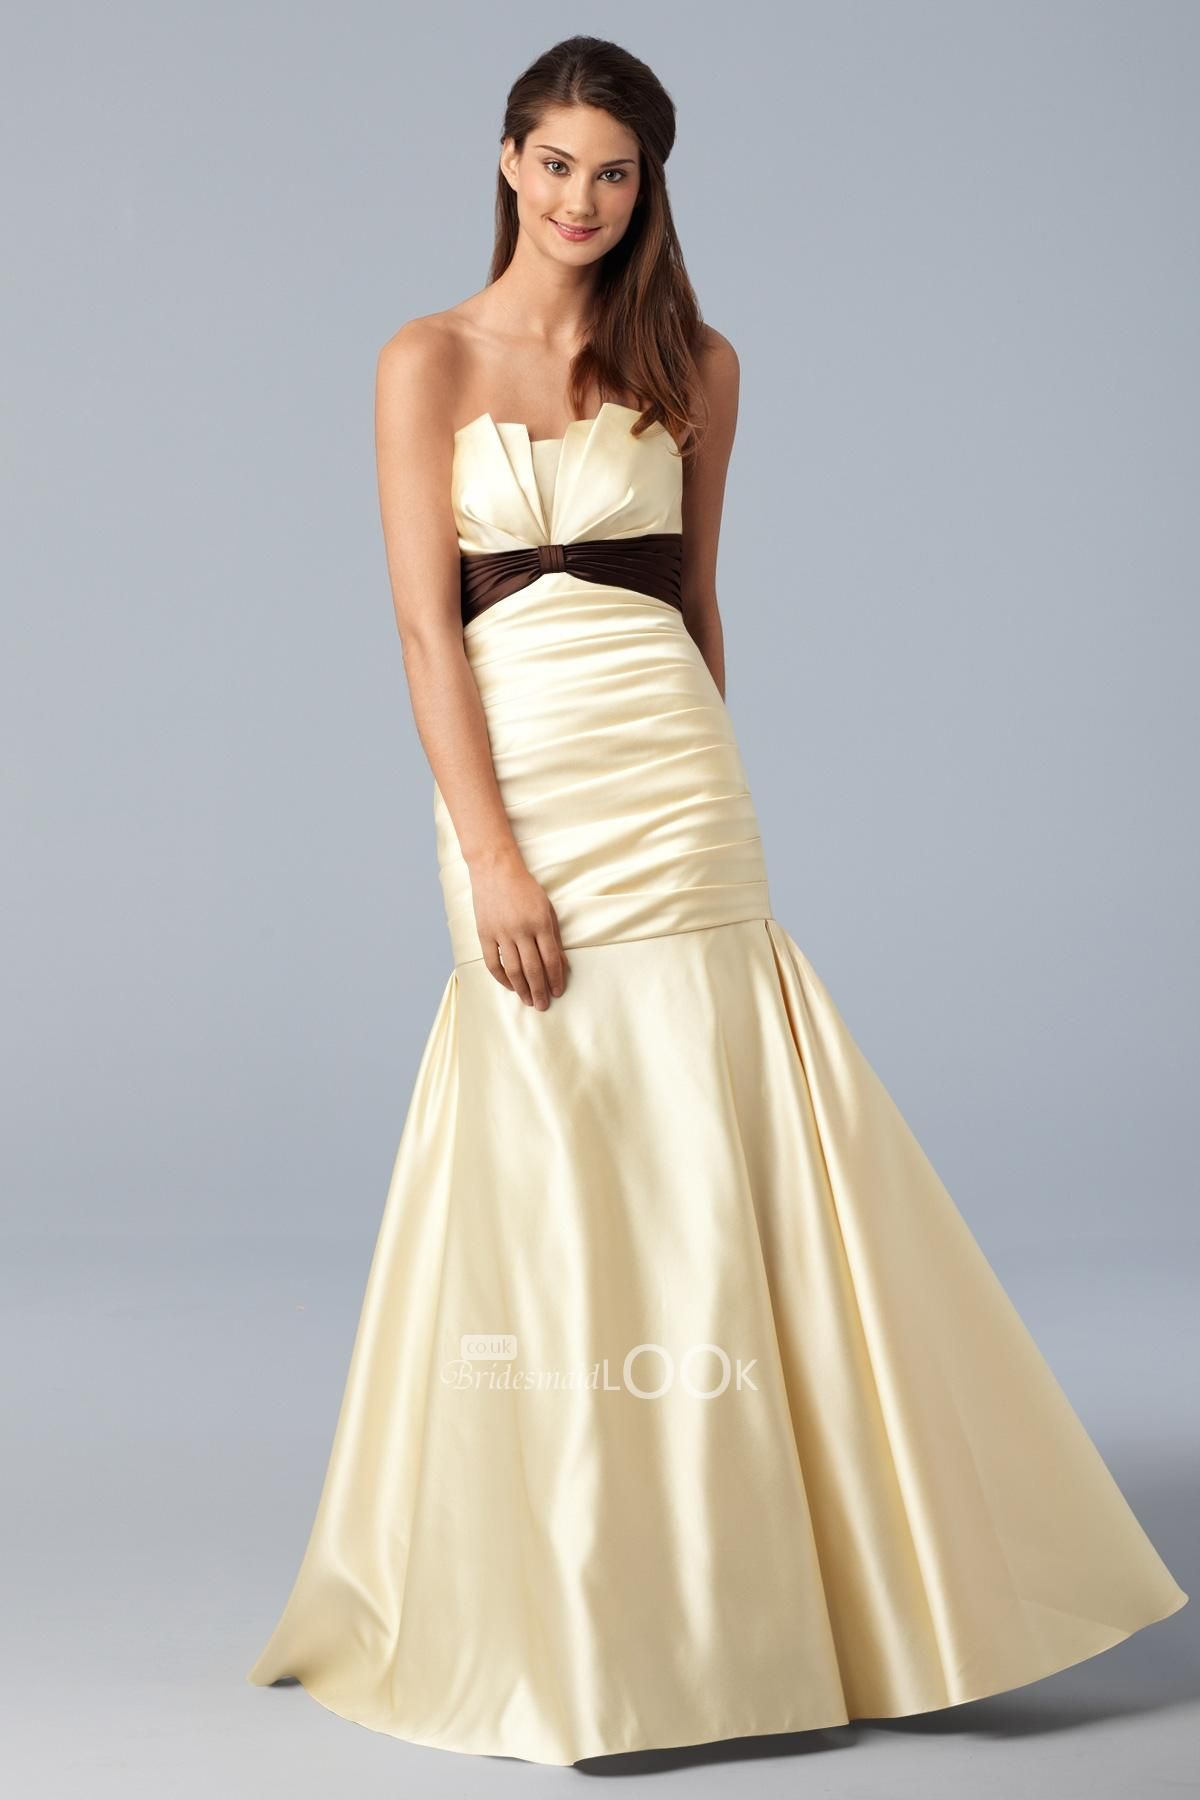 Wedding dresses lemon bridesmaid dresses style pinterest wedding dresses lemon bridesmaid dresses ombrellifo Image collections